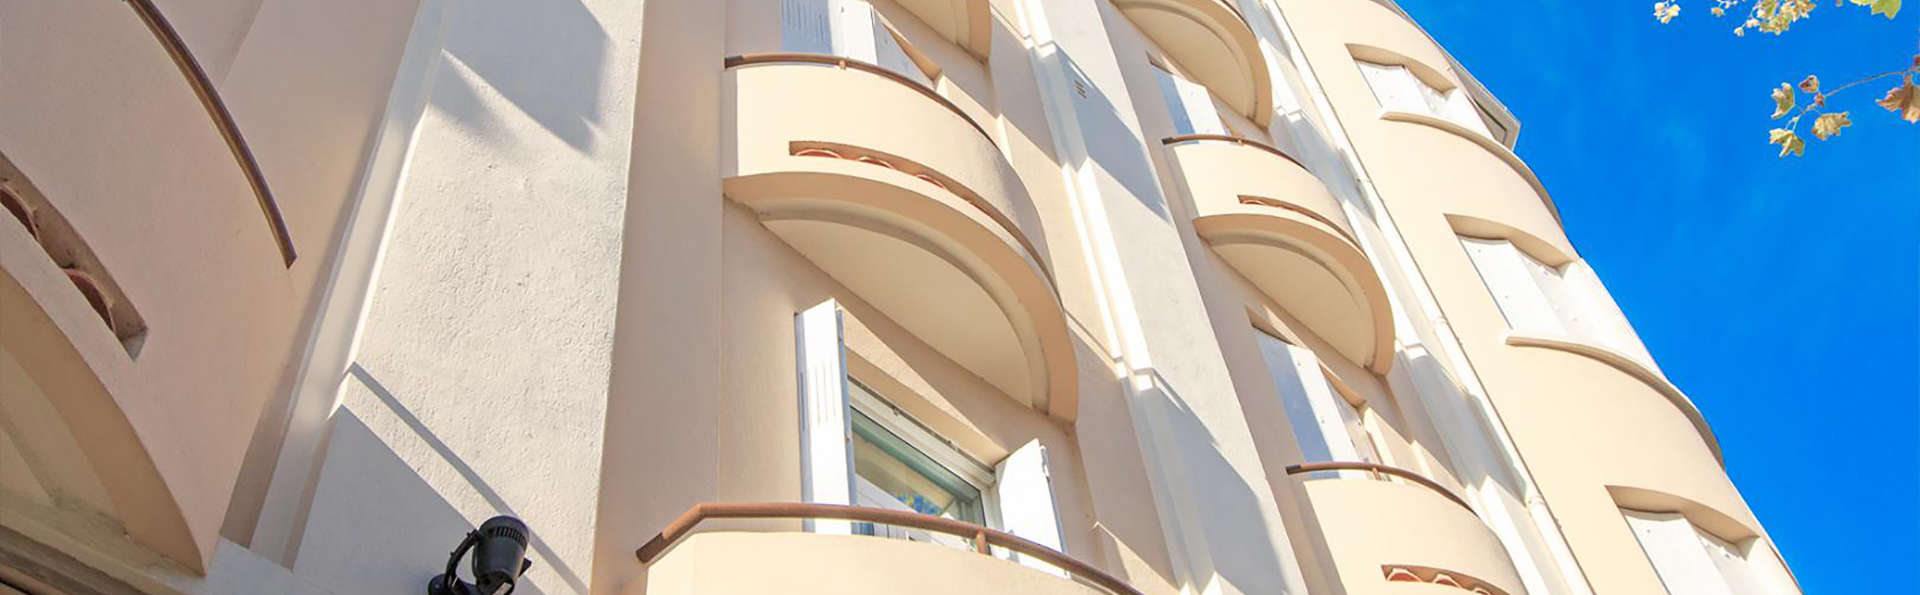 Mondial Hotel - Edit_Front.jpg